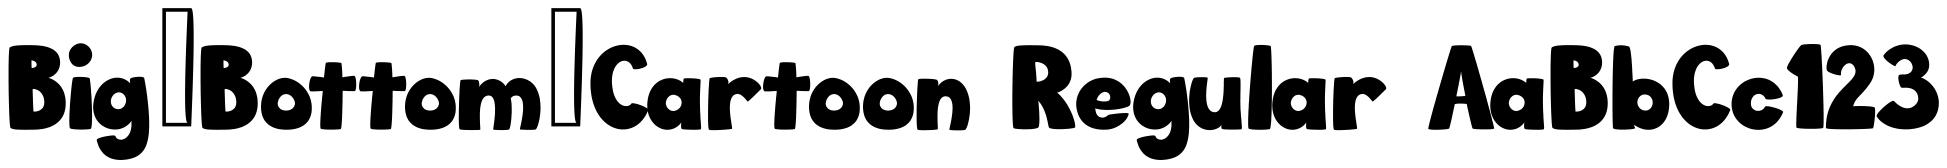 Big_Bottom_Cartoon_Normal